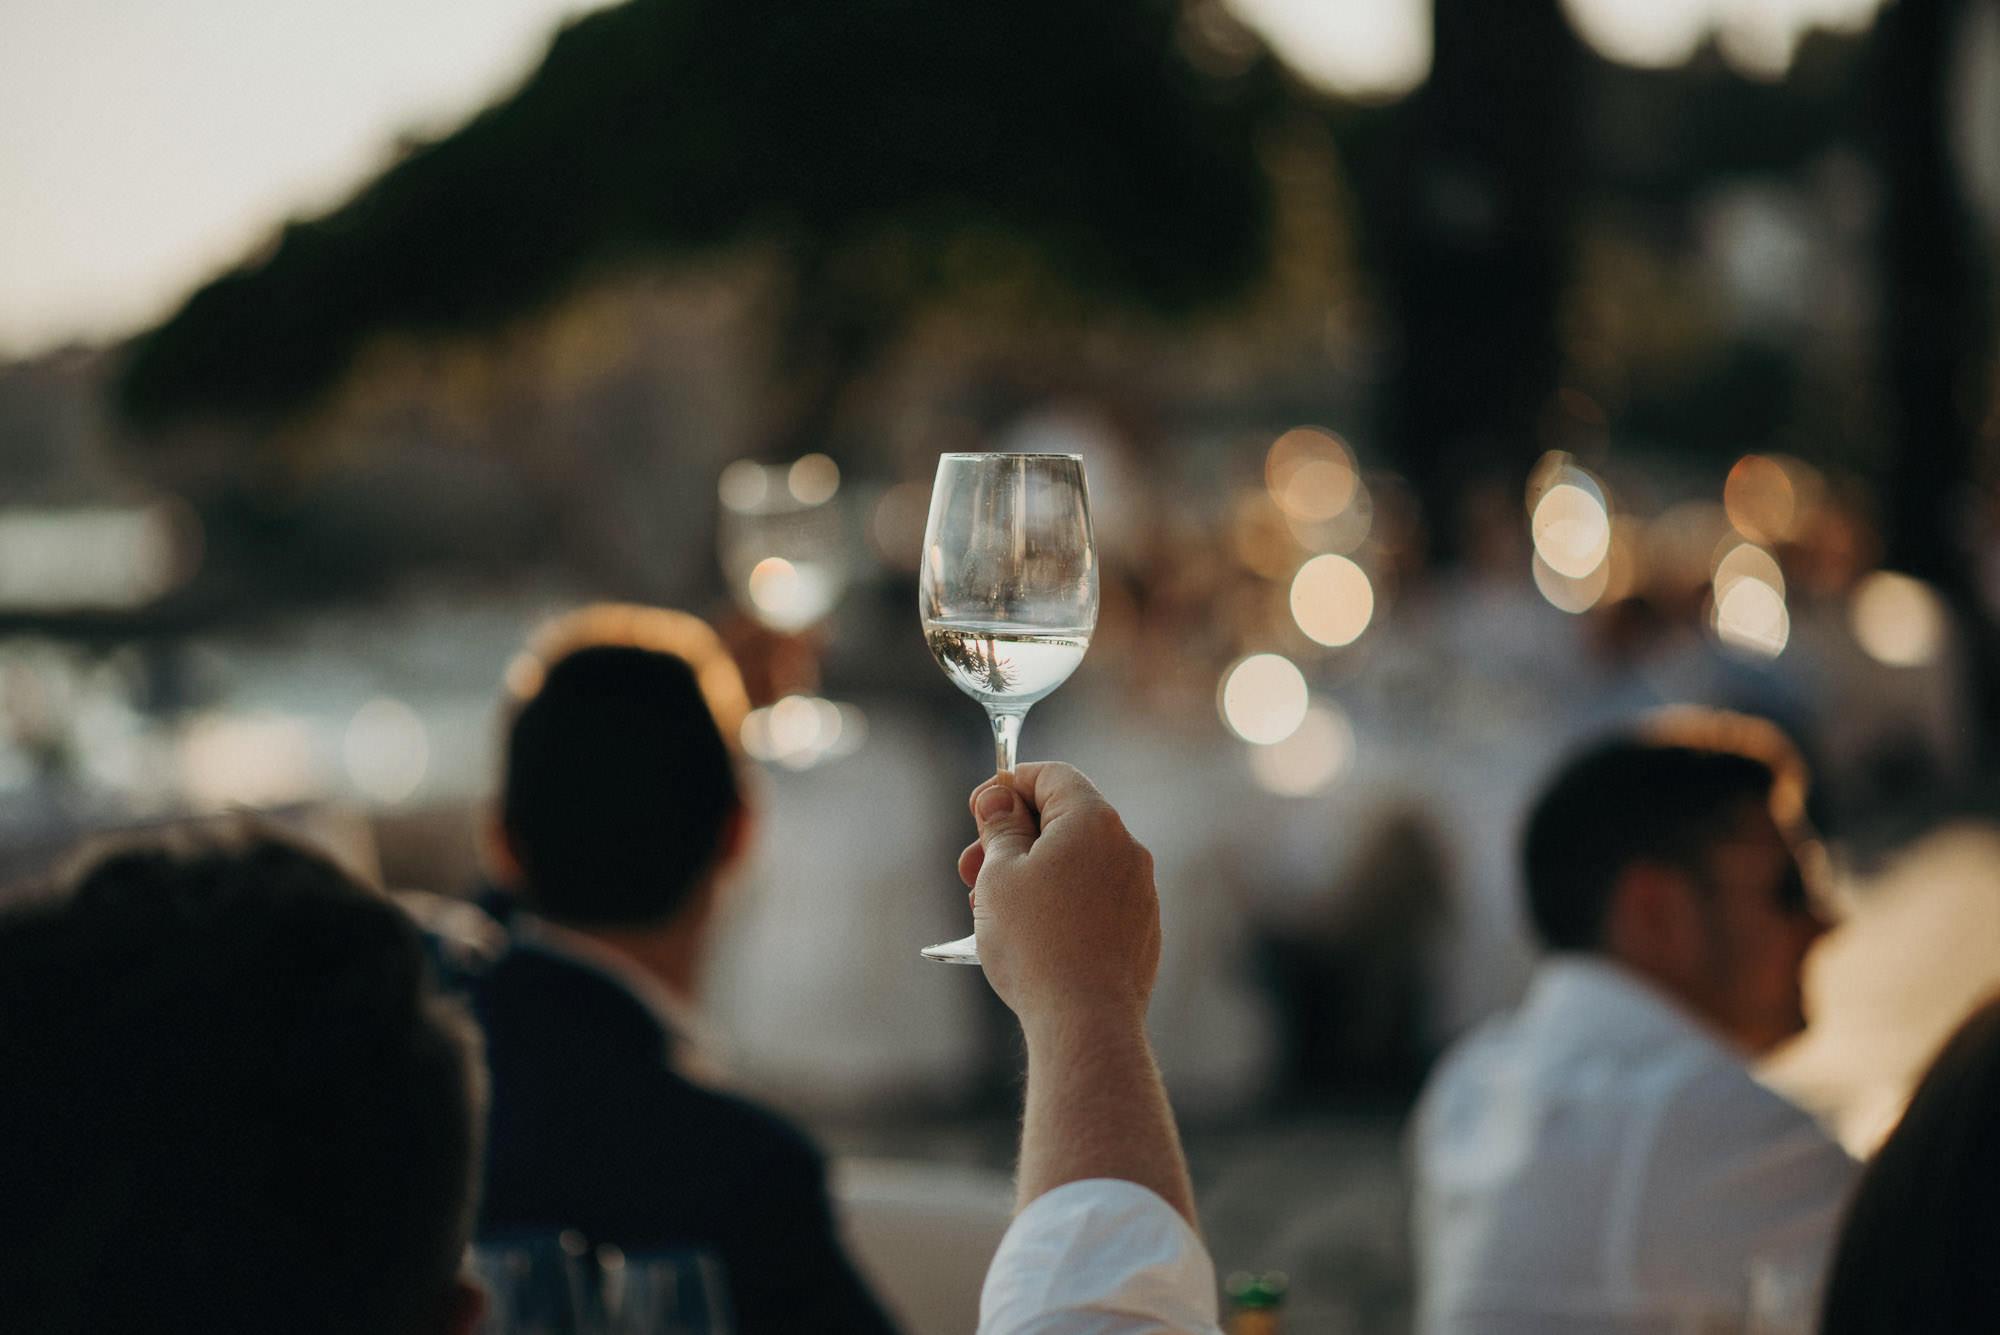 dubrovnik_croatia_wedding_photographer-jere_satamo-destination_weddings-066-web.jpg